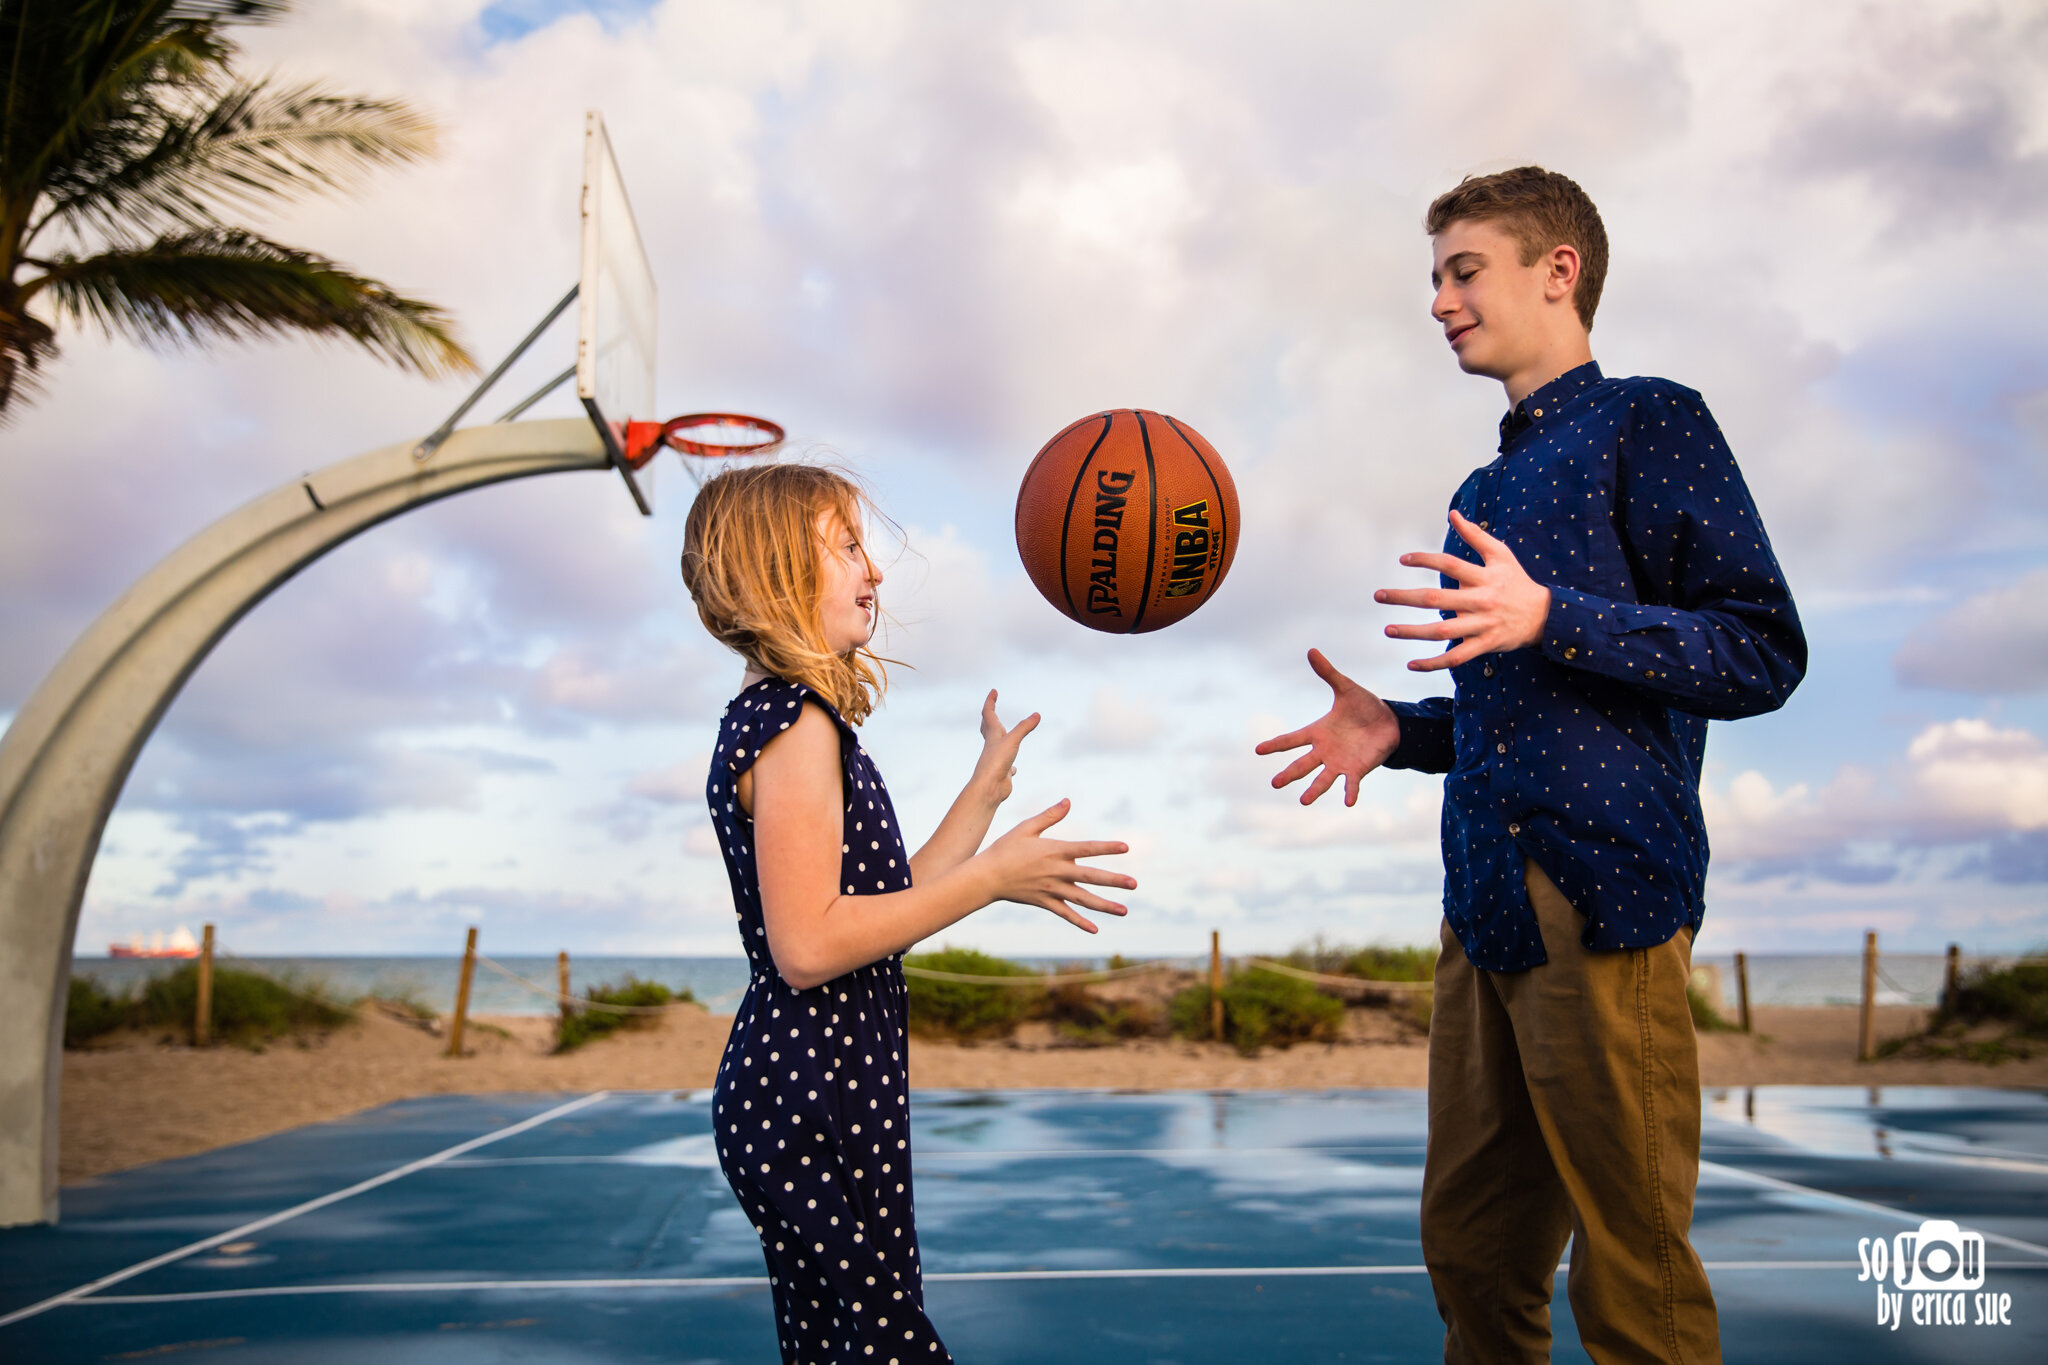 so-you-by-erica-sue-ft-lauderdale-beach-basketball-mitzvah-pre-shoot--2.JPG